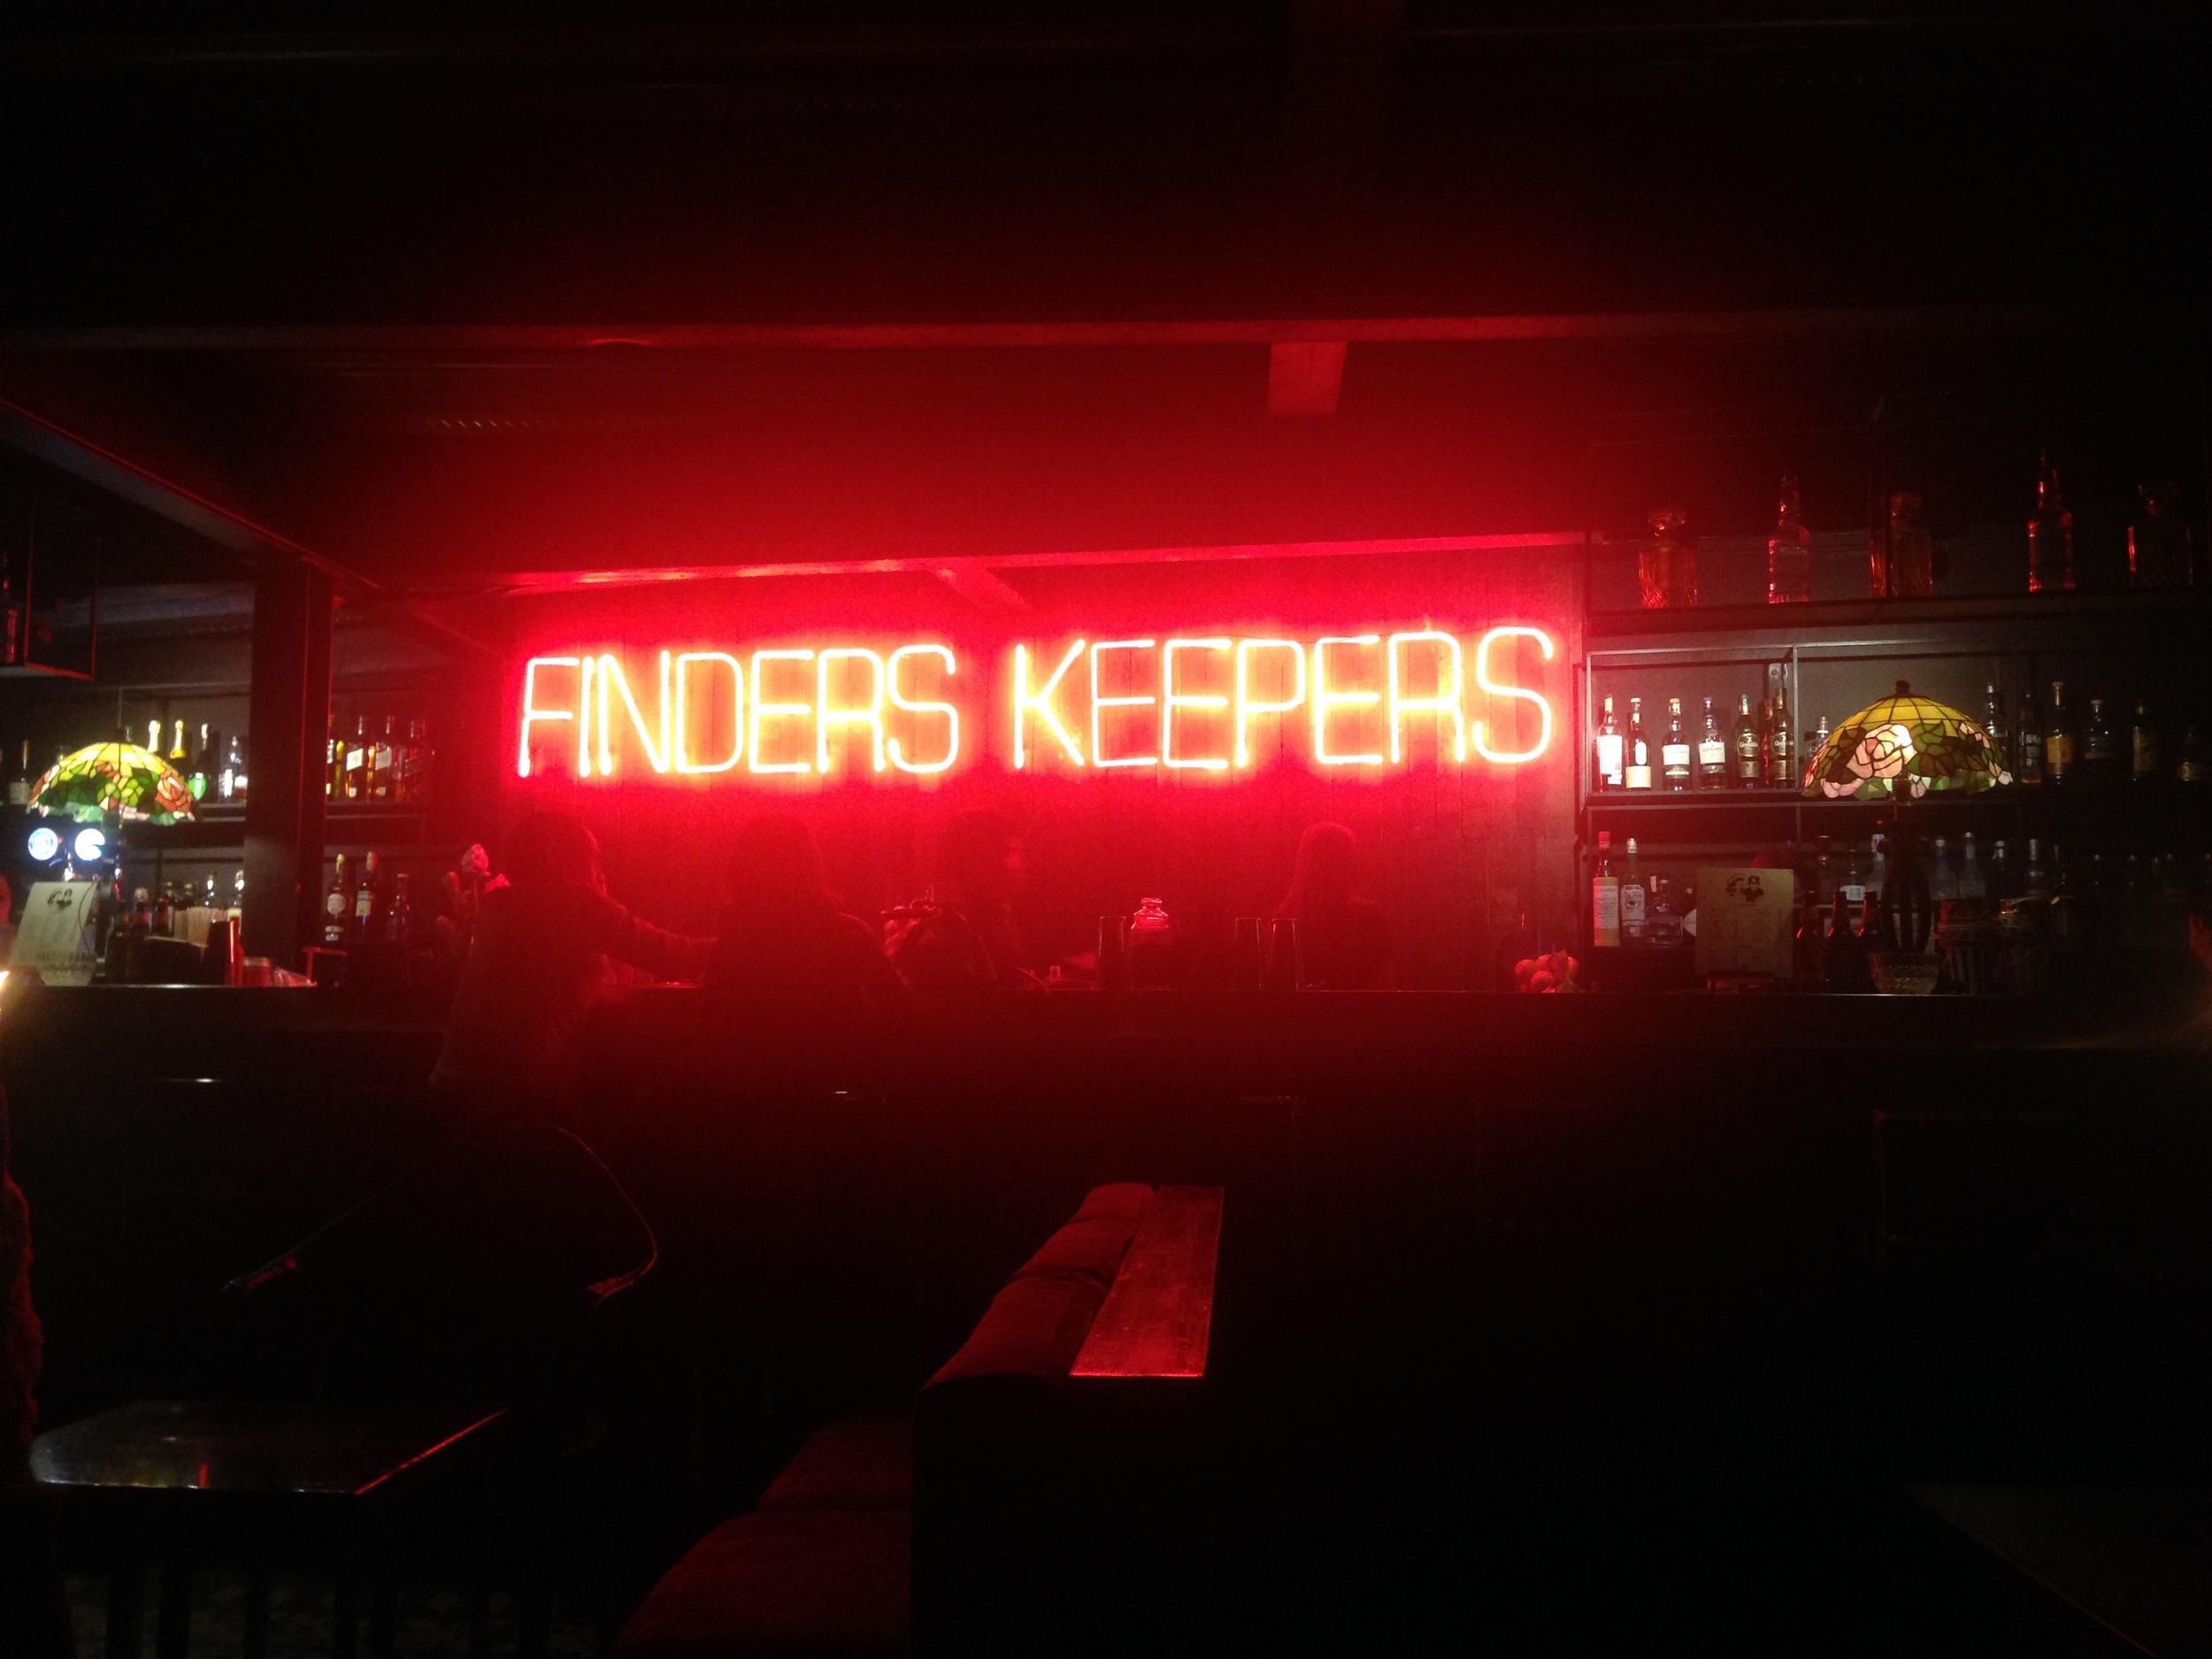 Finders Keepers bar Manila Sabio. Black market. Neon sign. 2015.